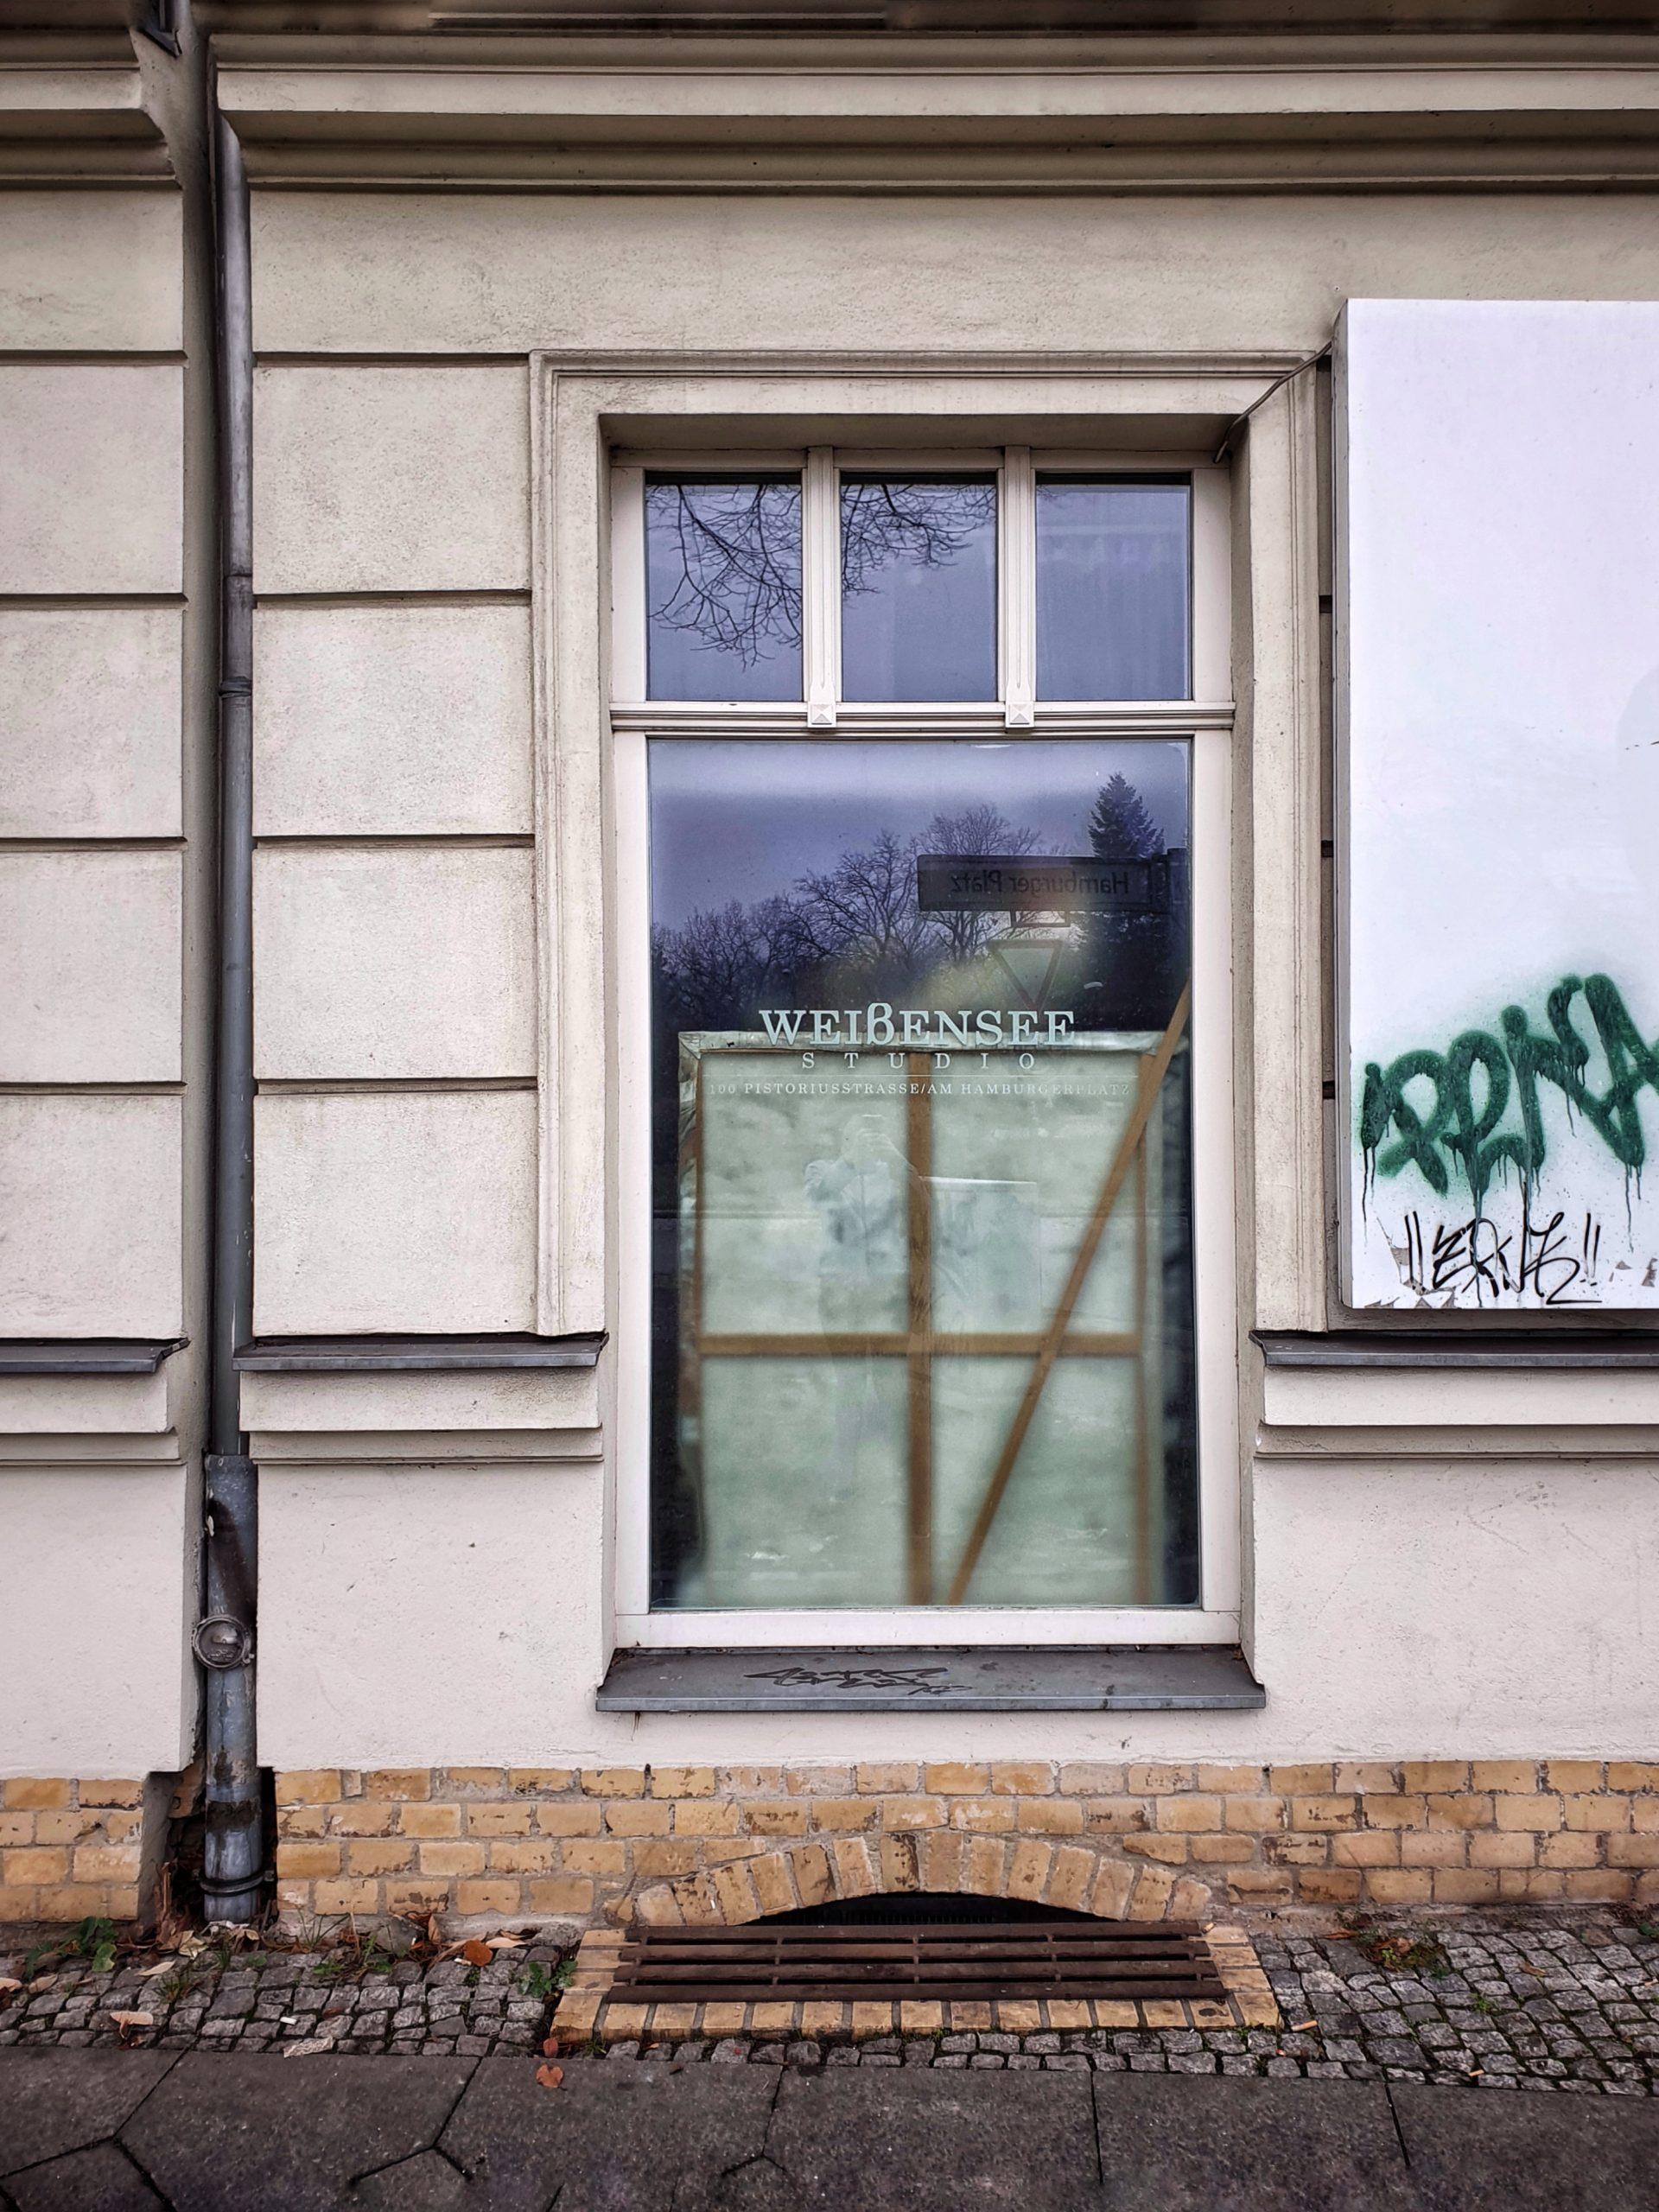 Studio Weissensee | Anne Seubert